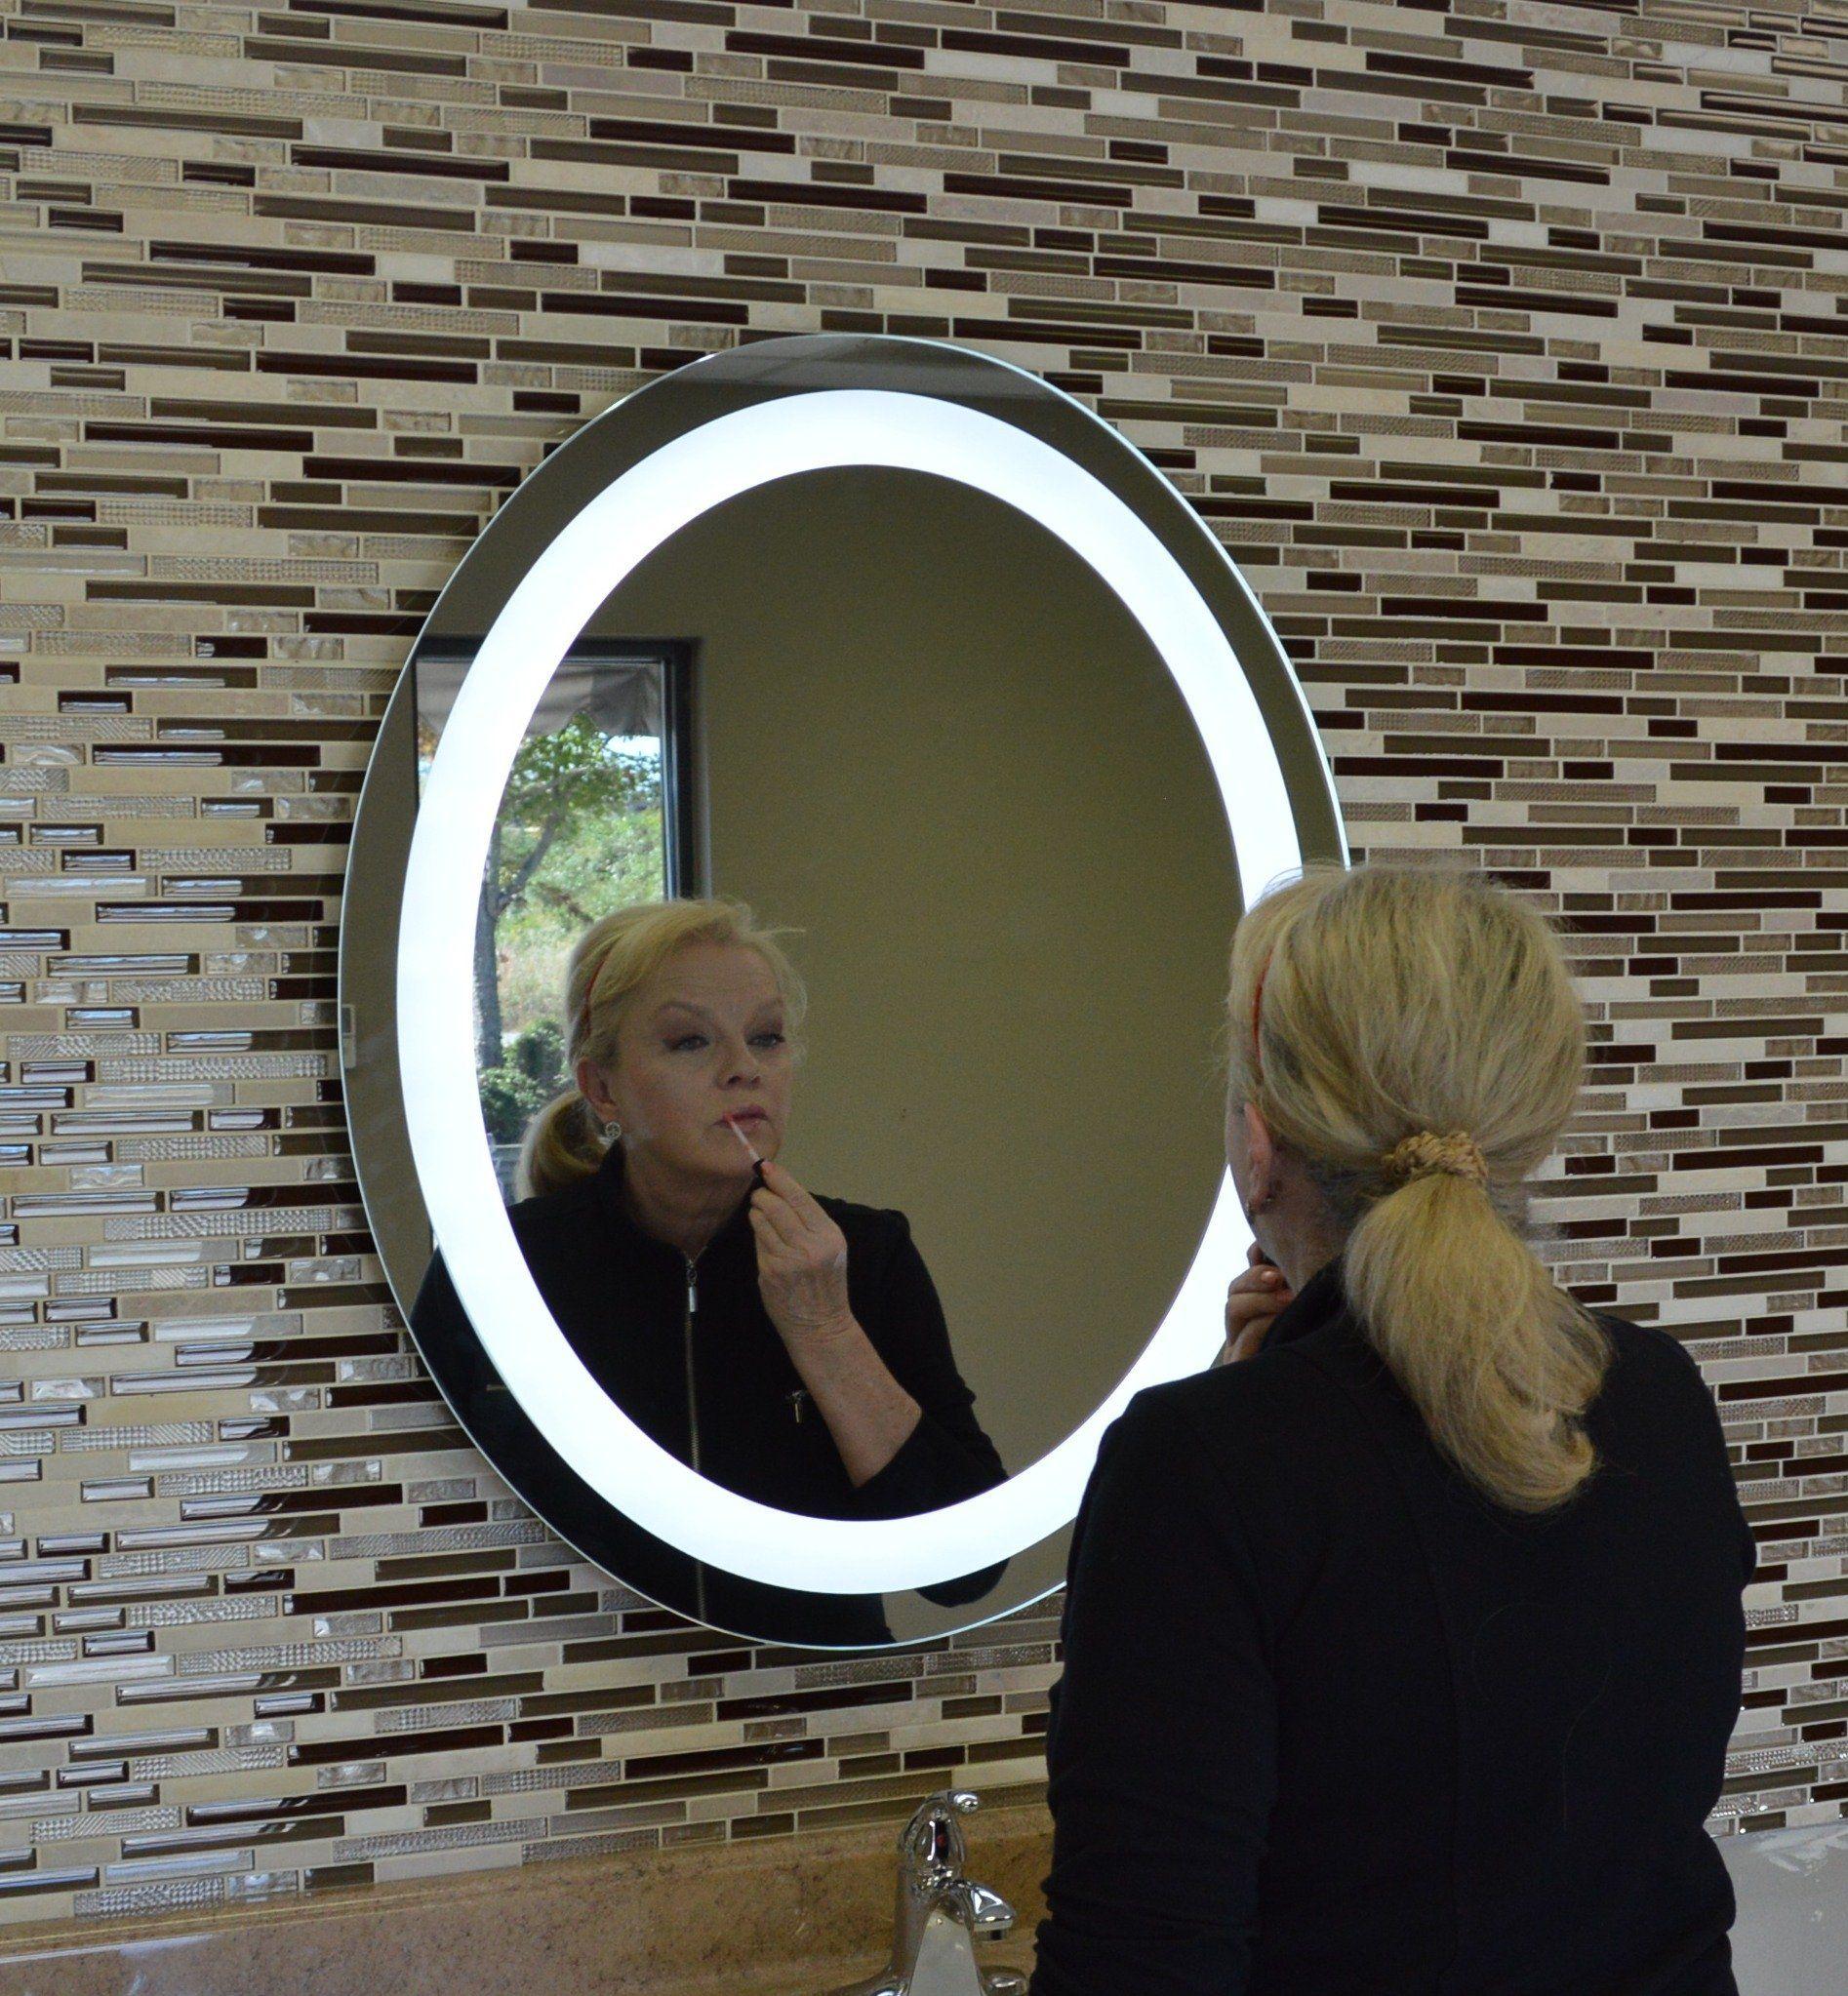 Front Lighted Led Bathroom Vanity Mirror 30 Bathroom Vanity Mirror Vanity Mirror Led Vanity [ 2046 x 1894 Pixel ]